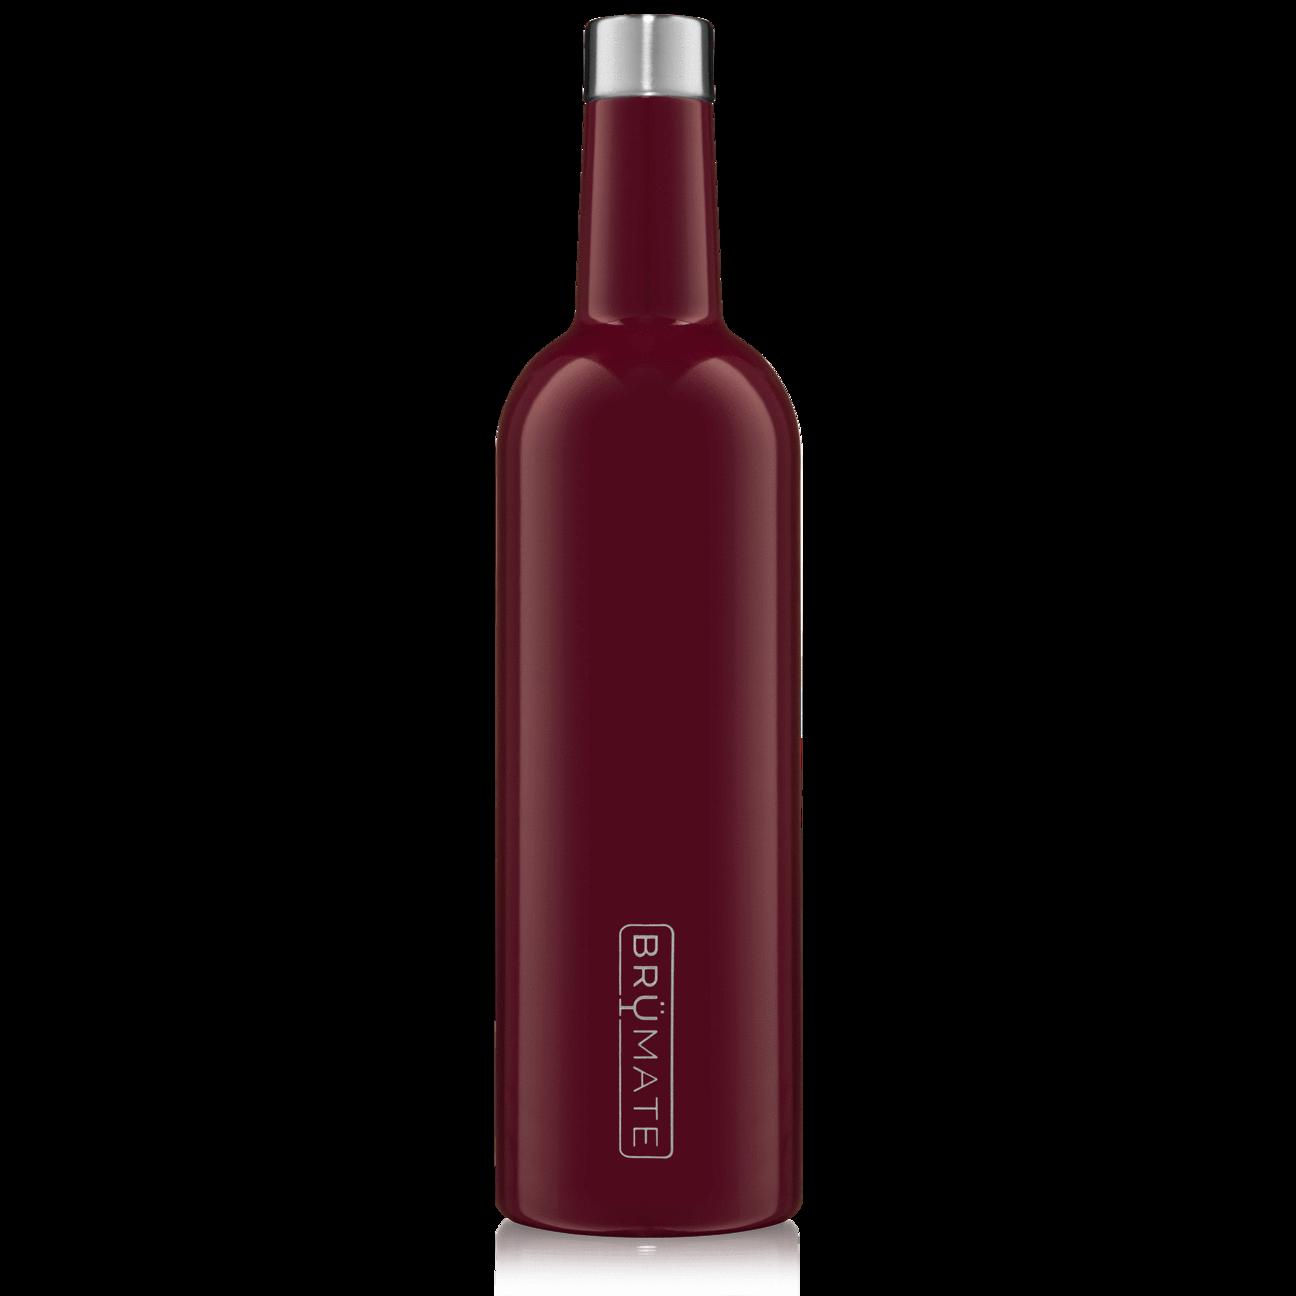 Winesulator Merlot